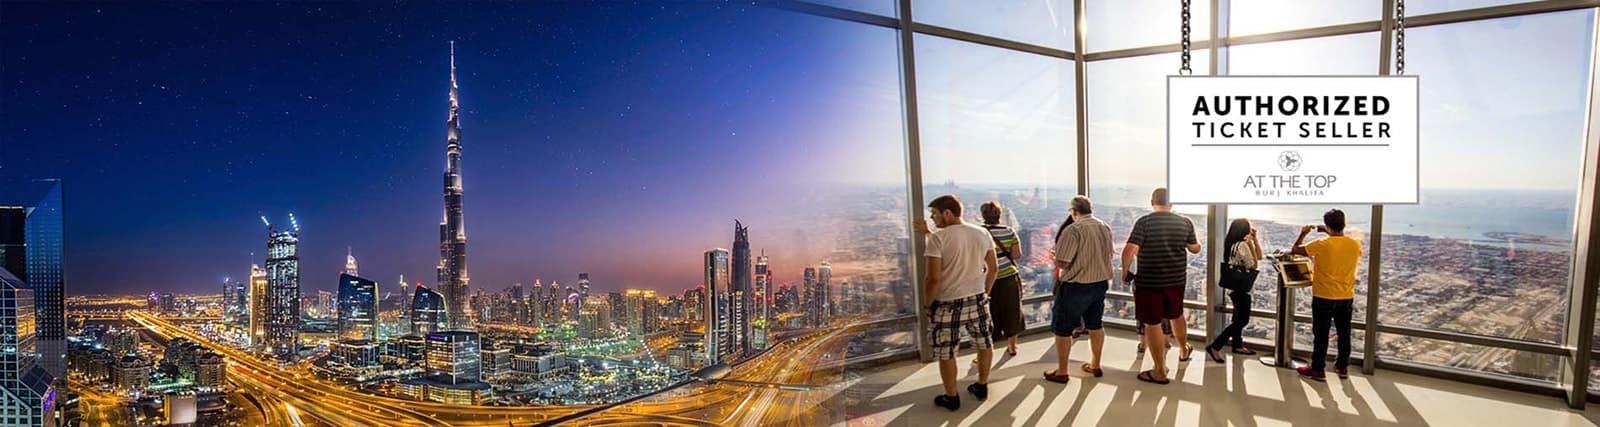 Dubai Burj Khalifa Tickets